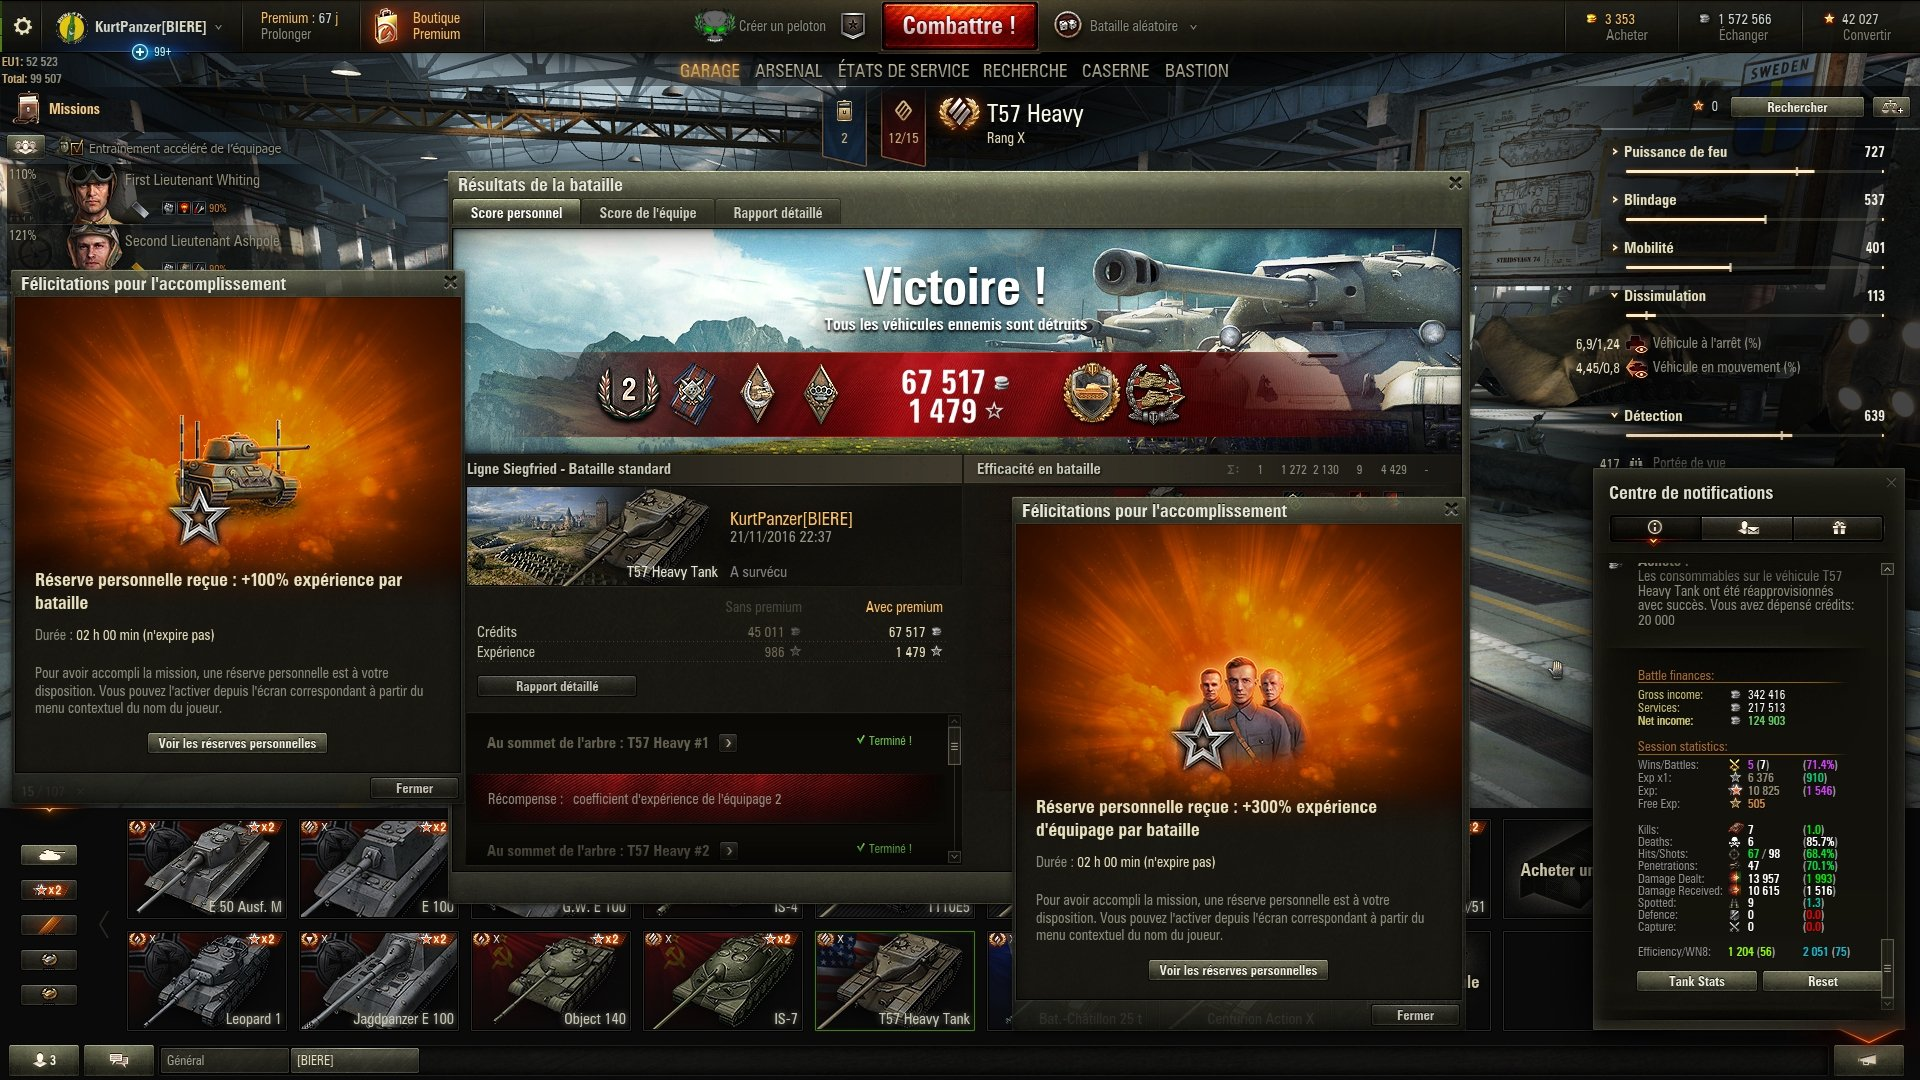 Screenshots et rapports de batailles - Page 12 F5efbcad-ac14-4378-95fc-63e21ff9f4e4